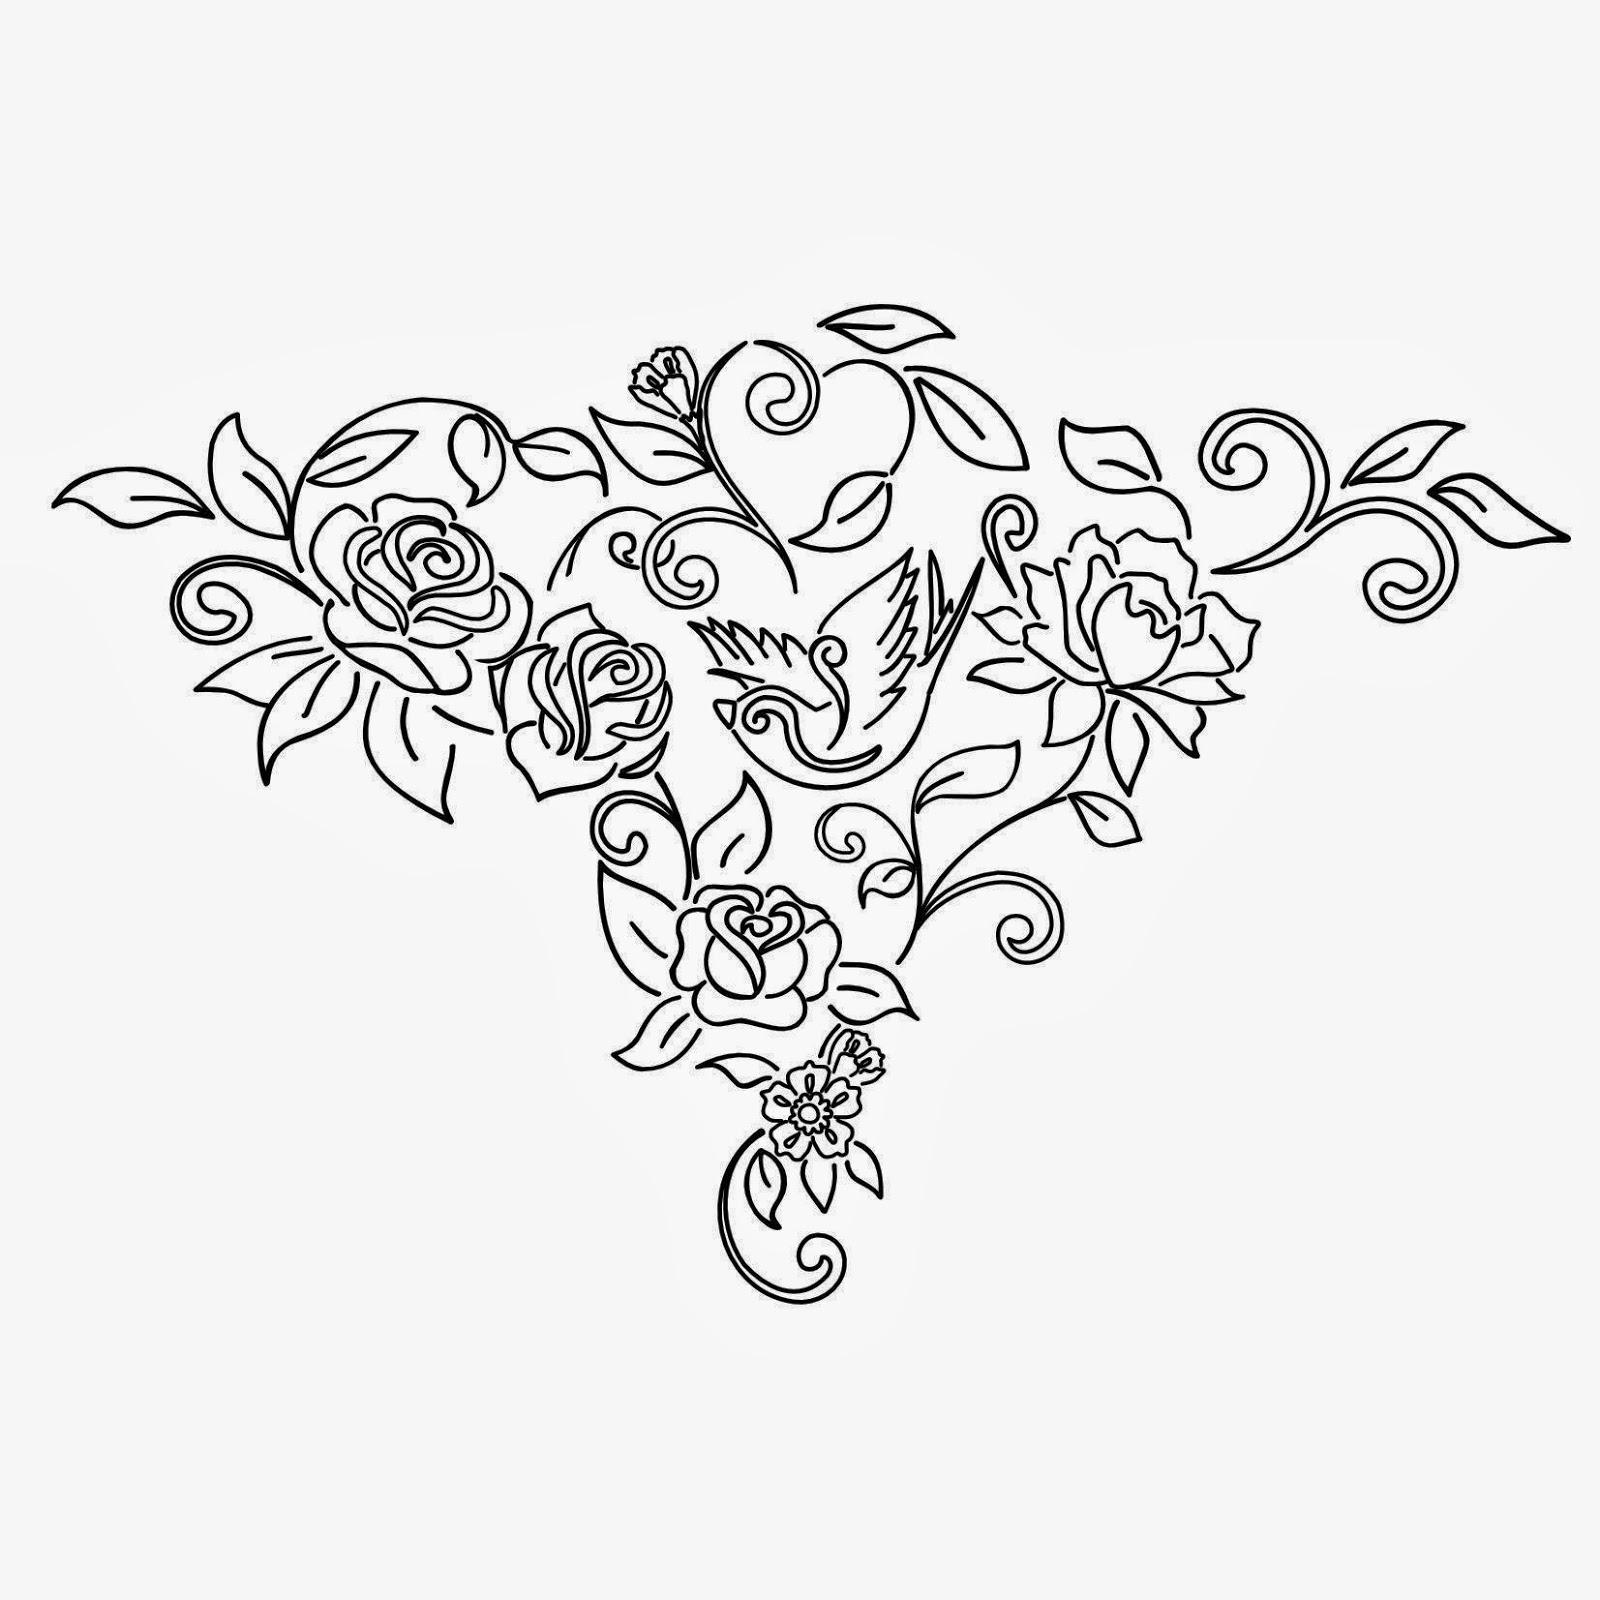 Roses and bird tattoo stencil